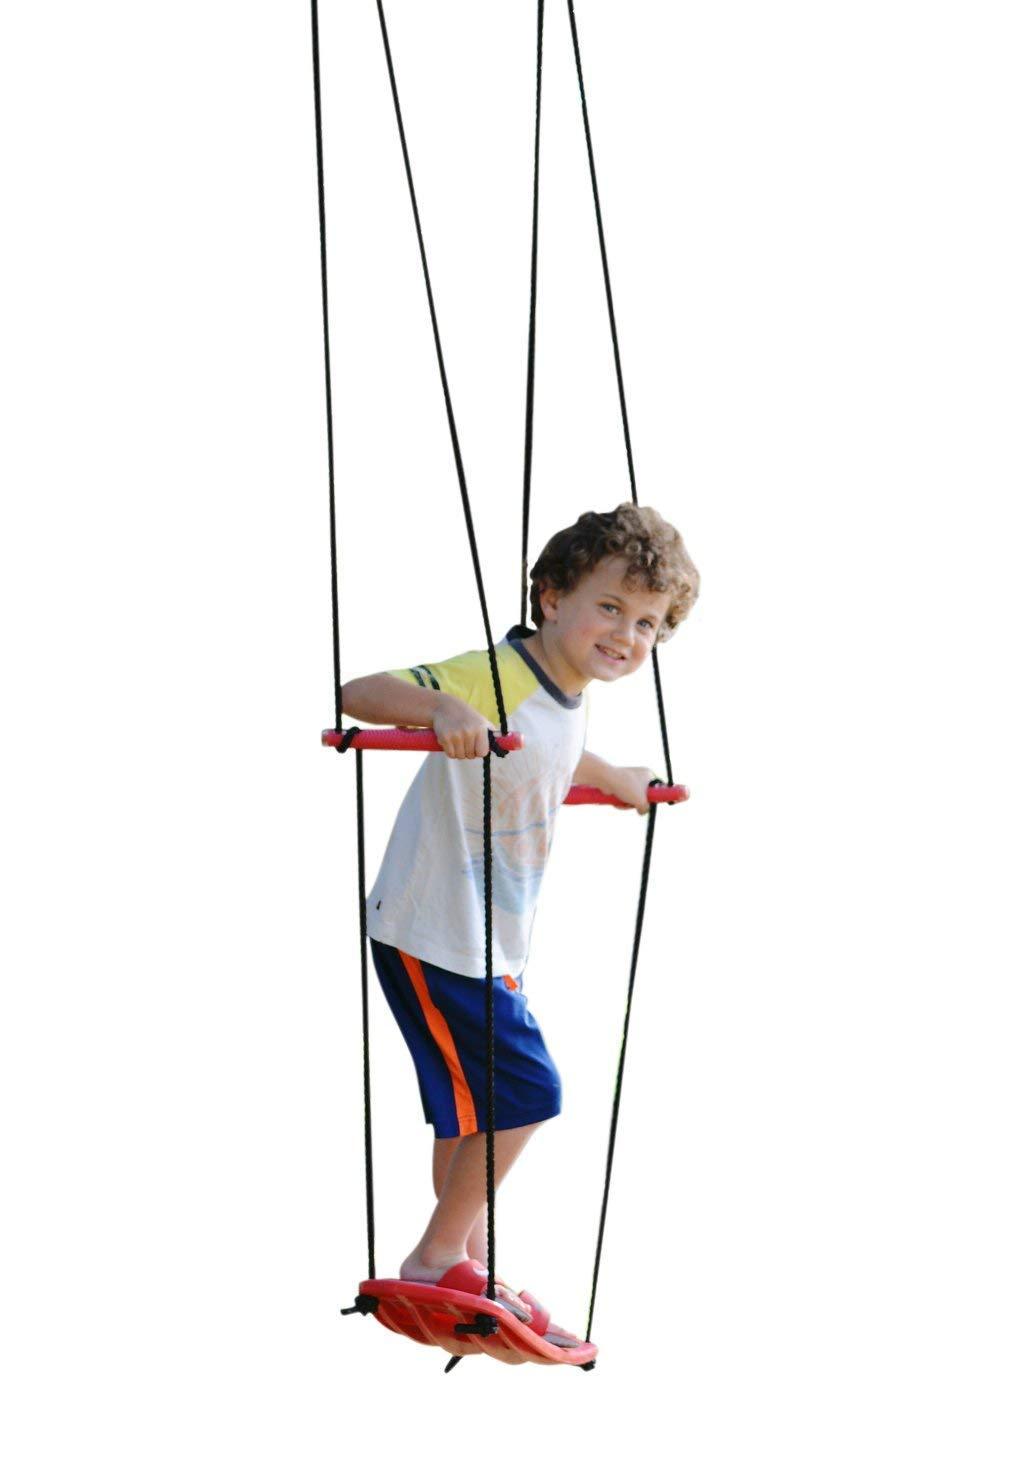 Playground Lovely Baby Children Kid Swing Tree Plastic Swing Seat Hanging Swing Seat Indoor Playground Backyard Summer Holiday Gift With Rope Amusement Park